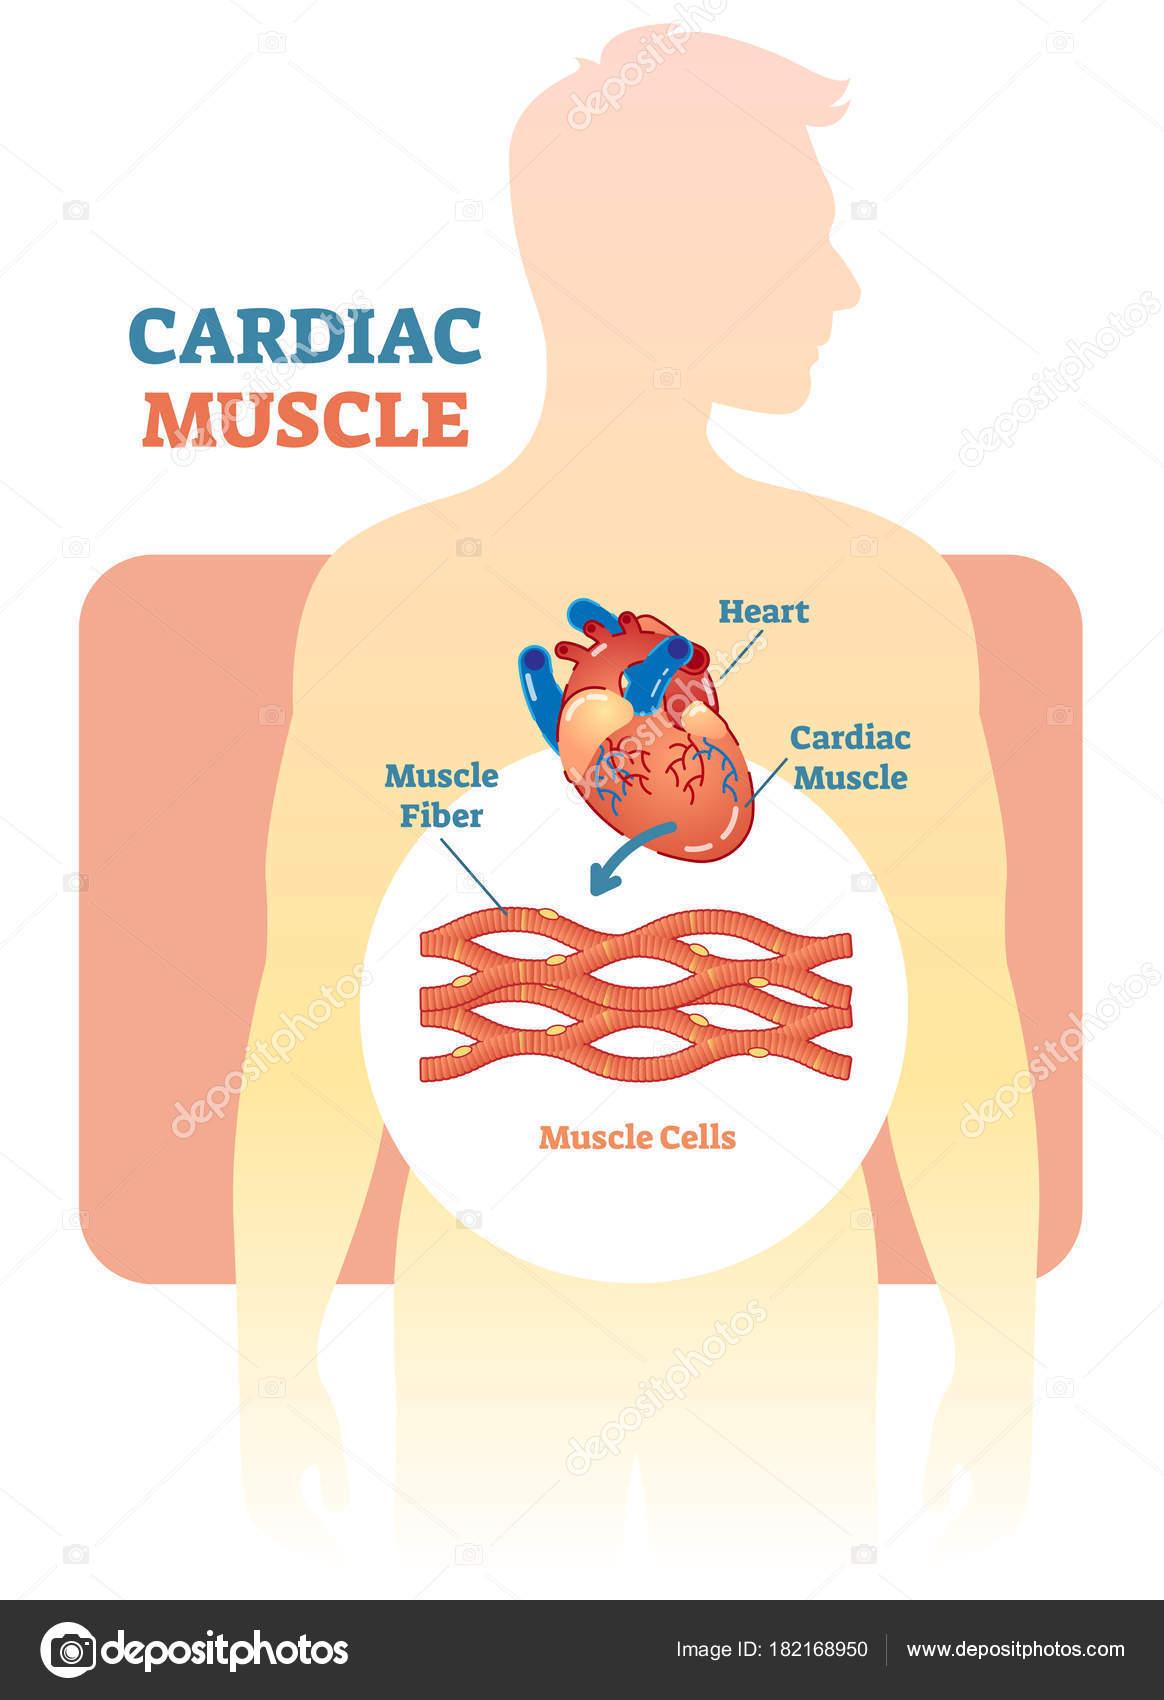 Músculo cardiaco vector ilustración diagrama esquema anatómico con ...